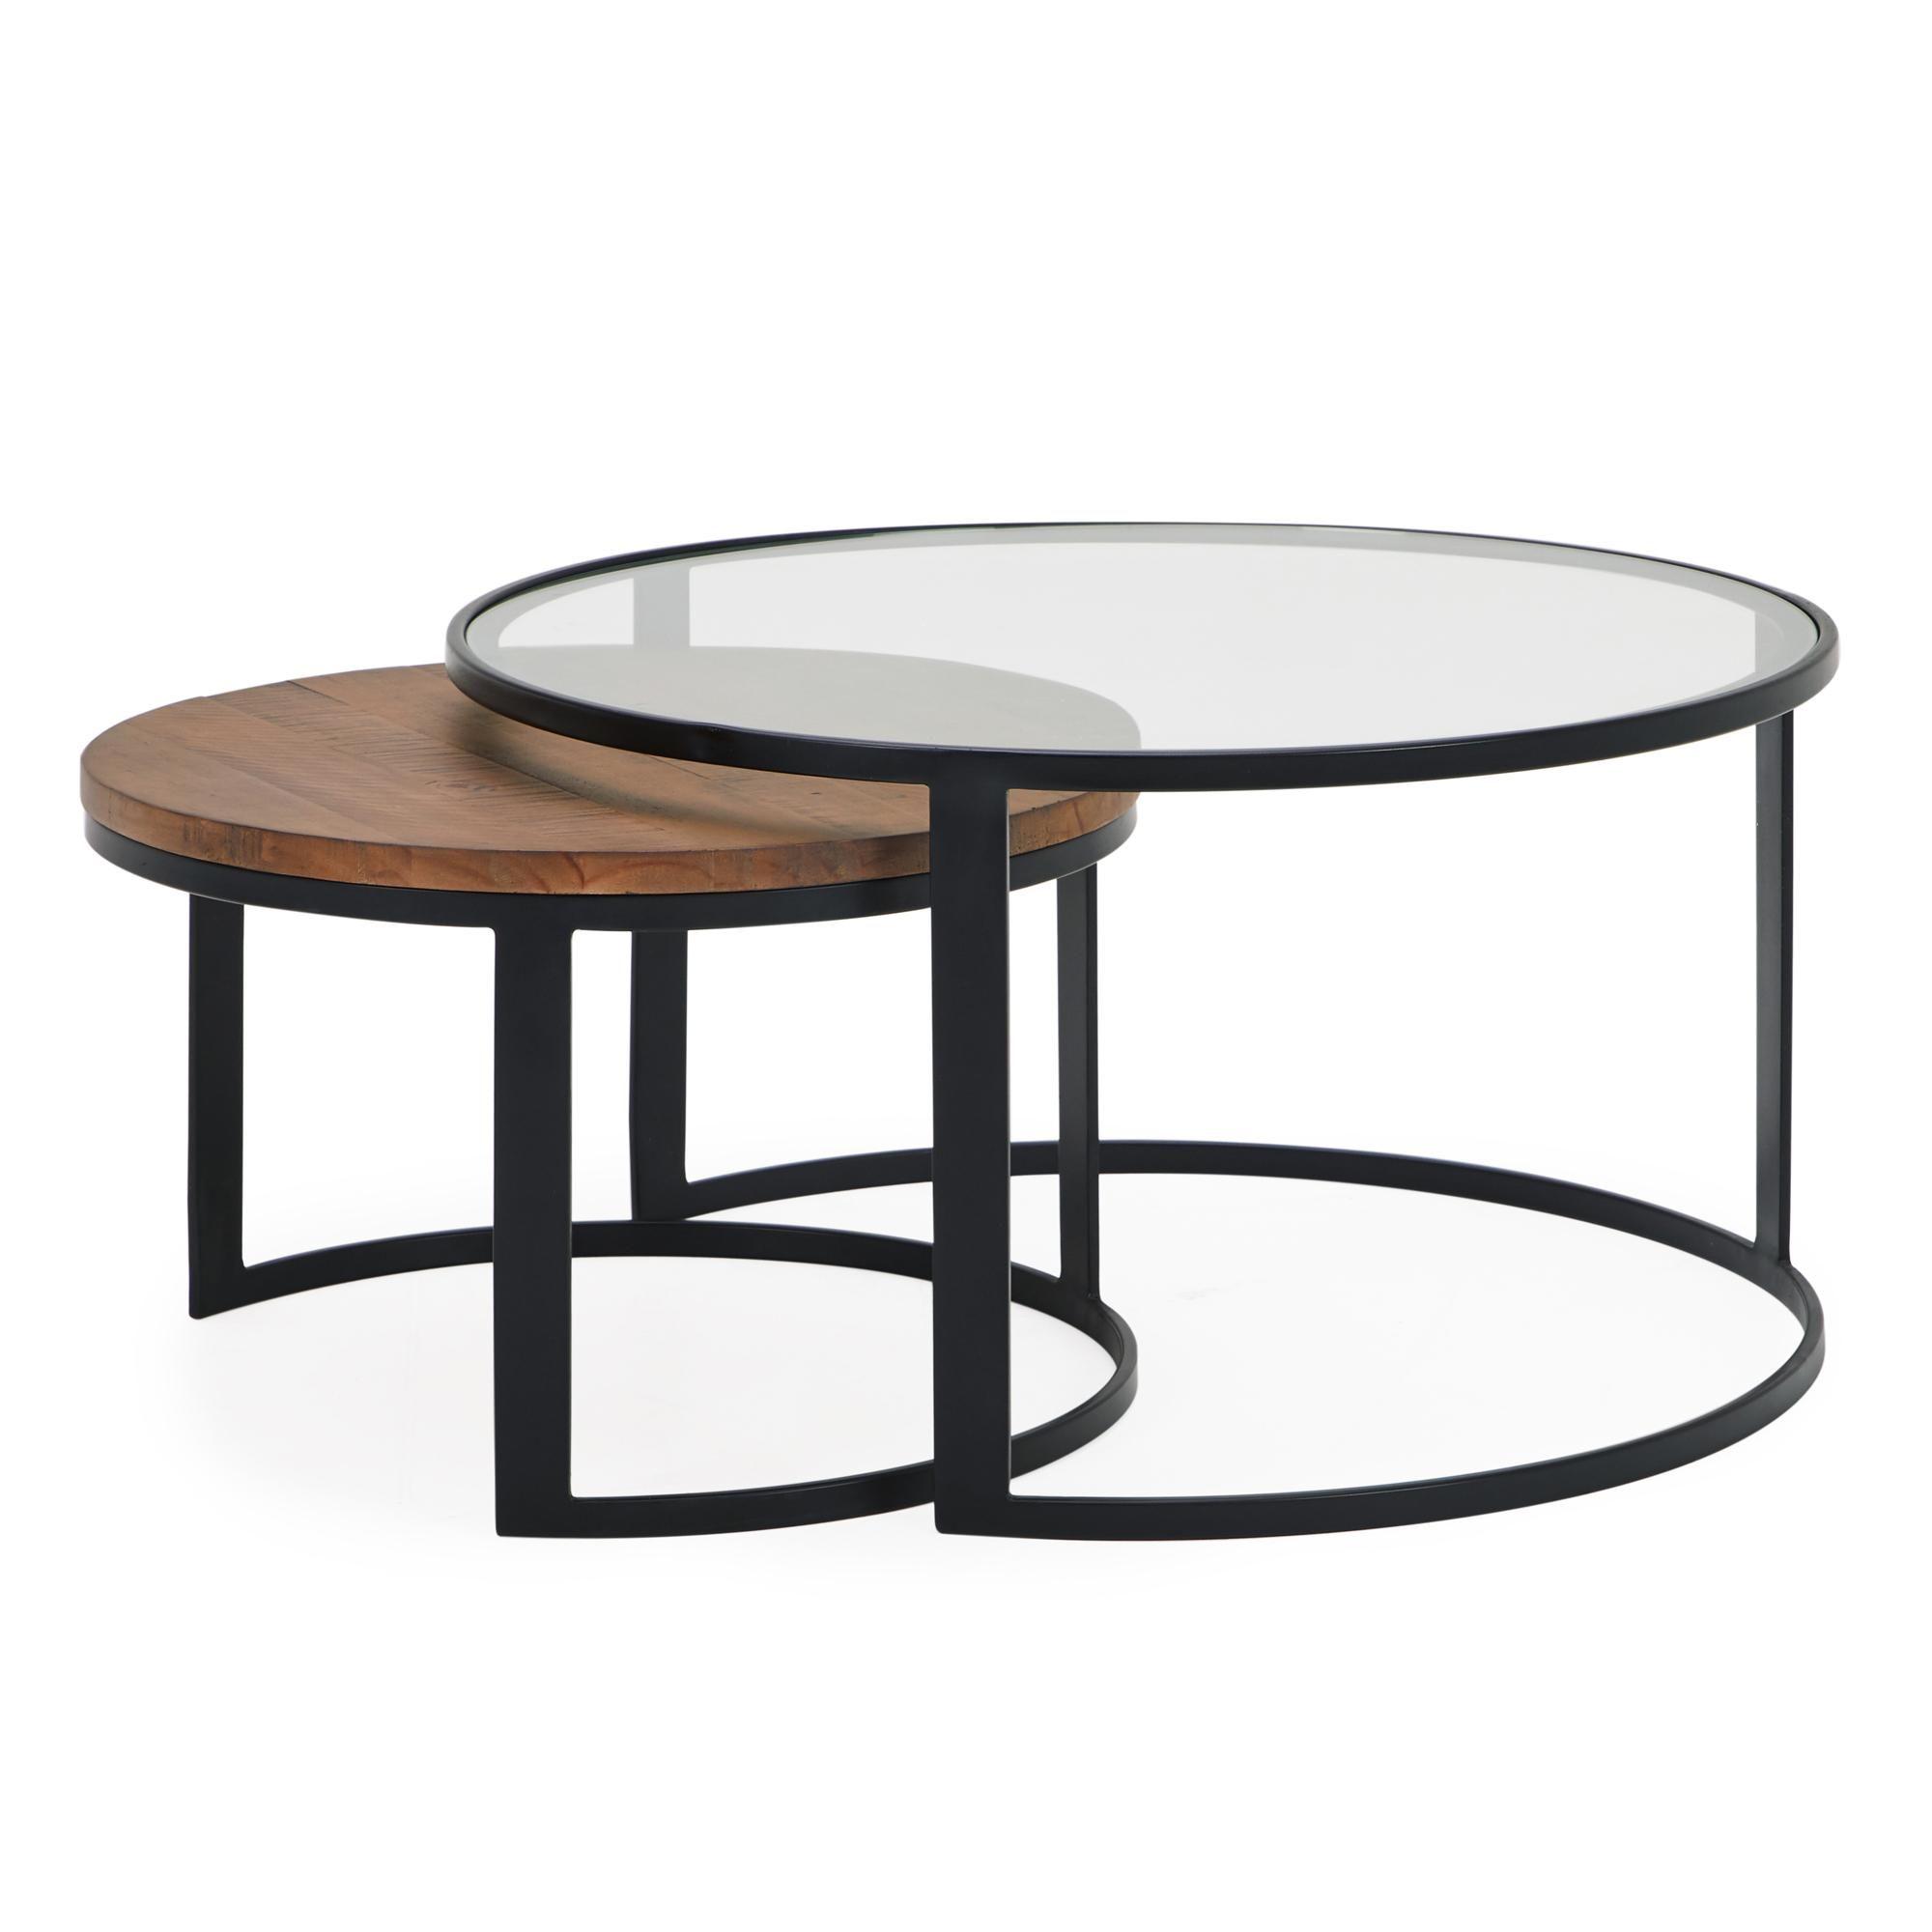 Jackson Set Of 2 Coffee Tables Black Glass Coffee Table Coffee Table Round Coffee Table Modern [ 2000 x 2000 Pixel ]